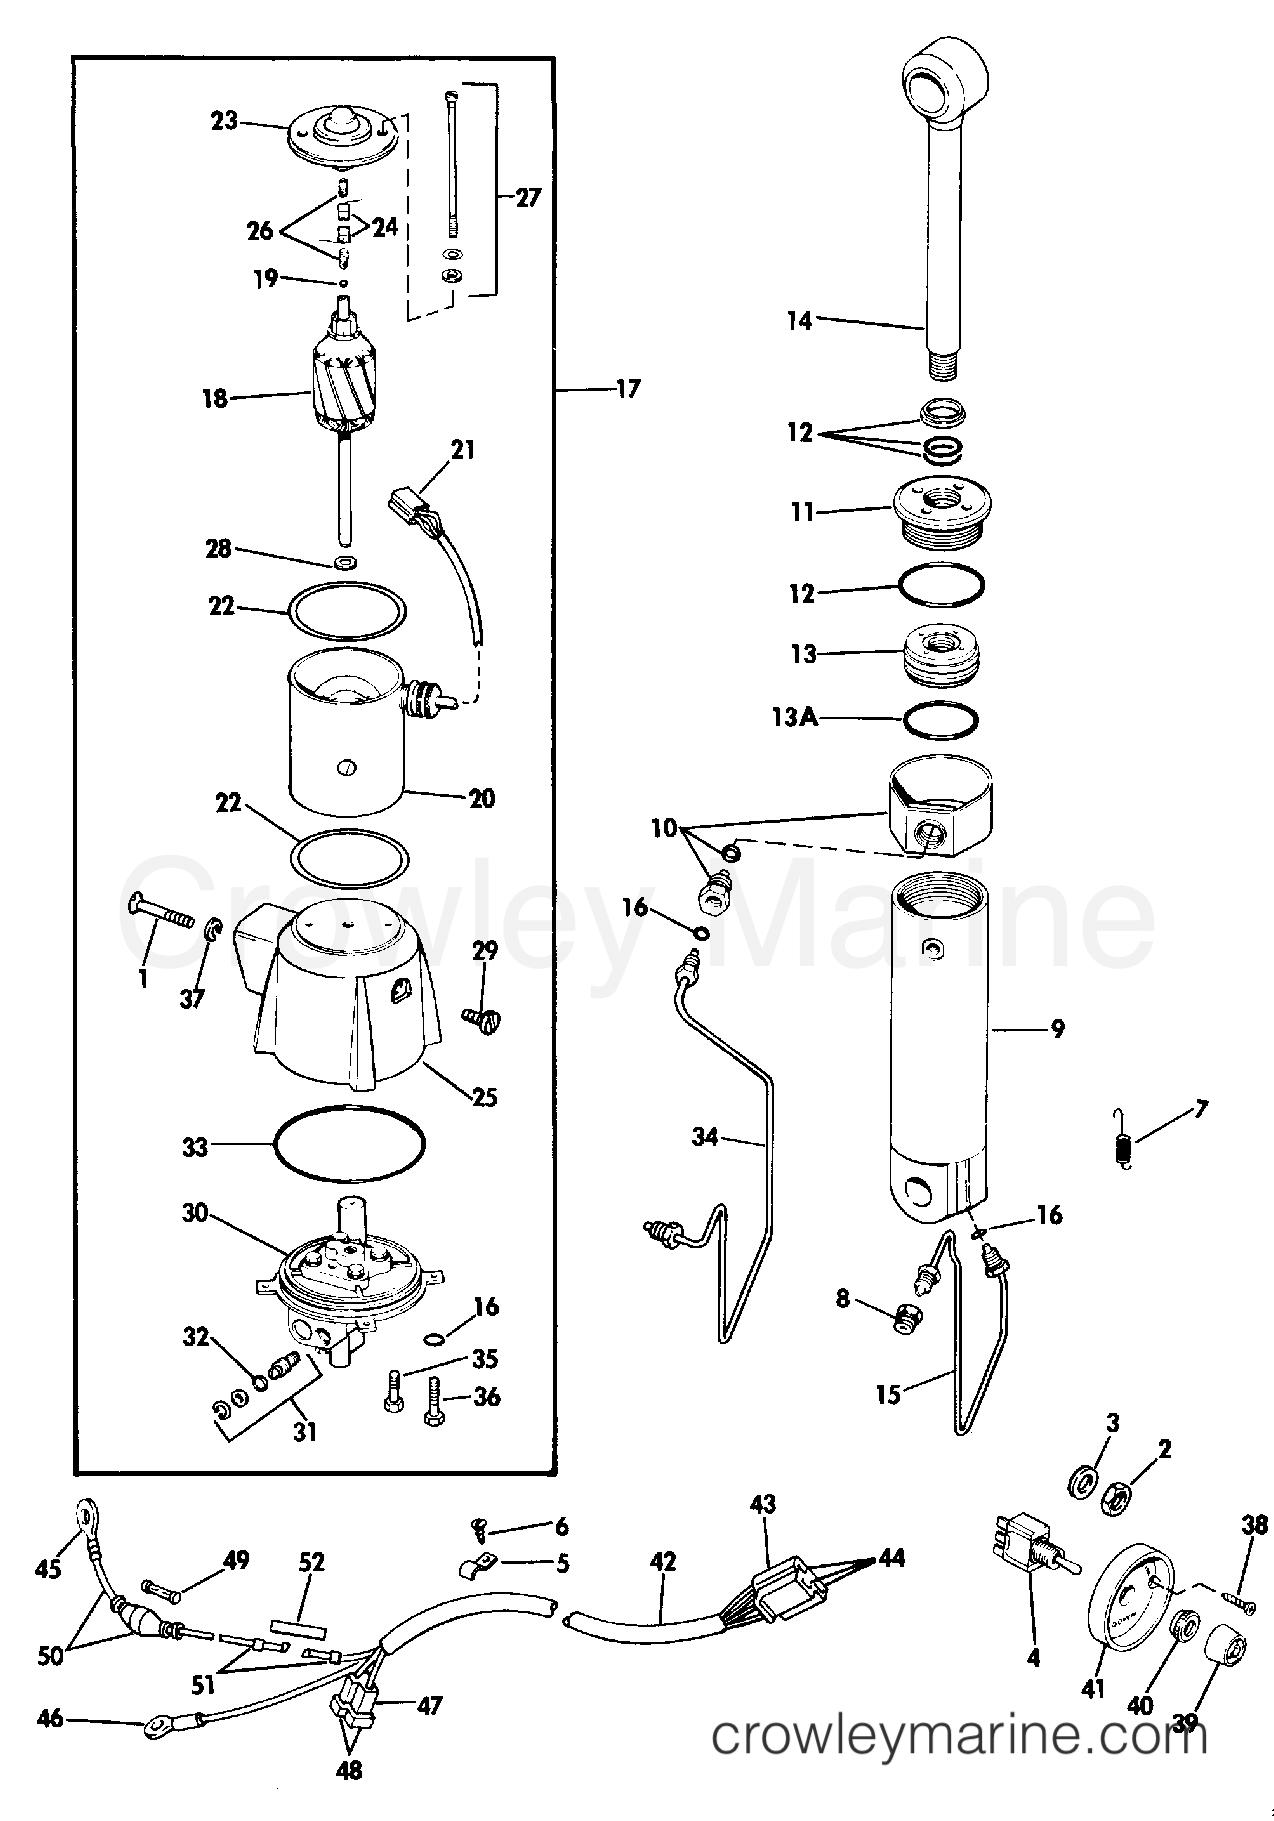 1987 Rigging Parts Accessories - Power Trim & Tilt - POWER TILT KIT ASSEMBLY 60 THRU 110